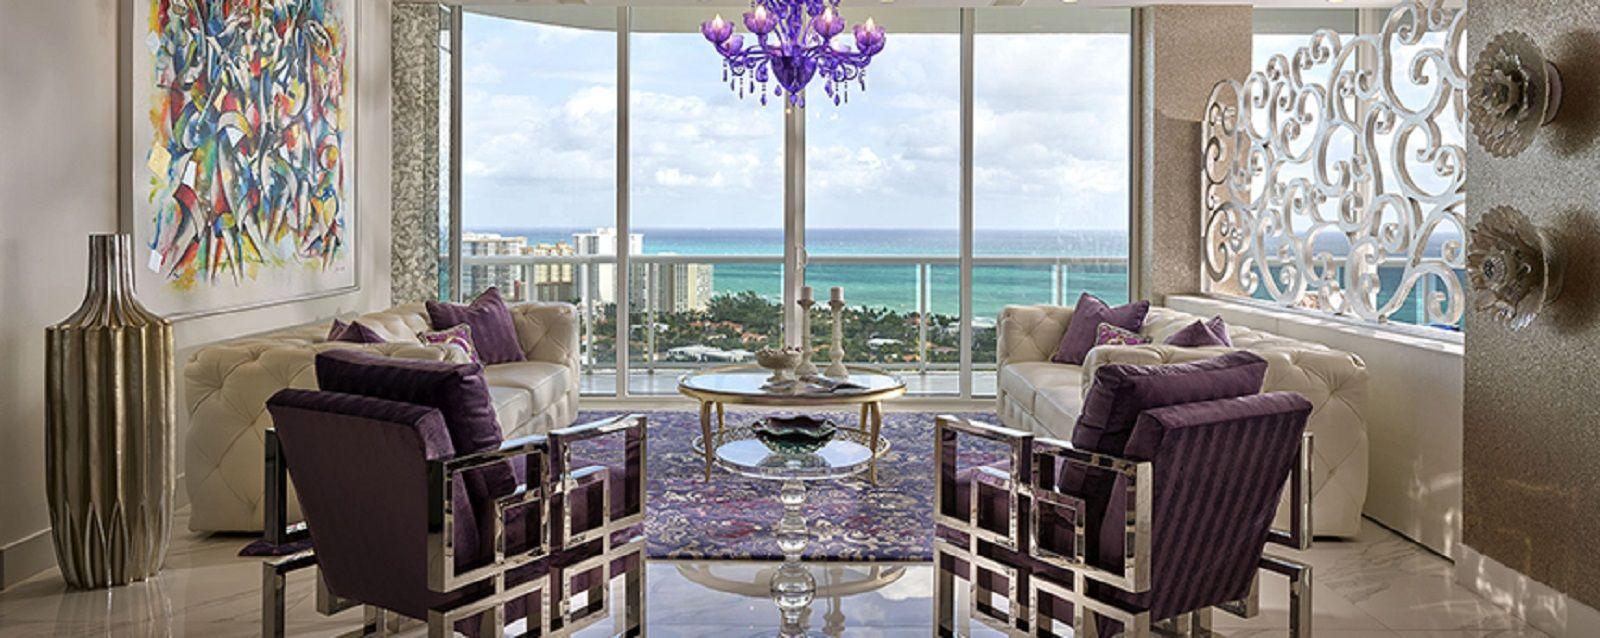 Fort Lauderdale Perla Lichi Design Award Winning Interior